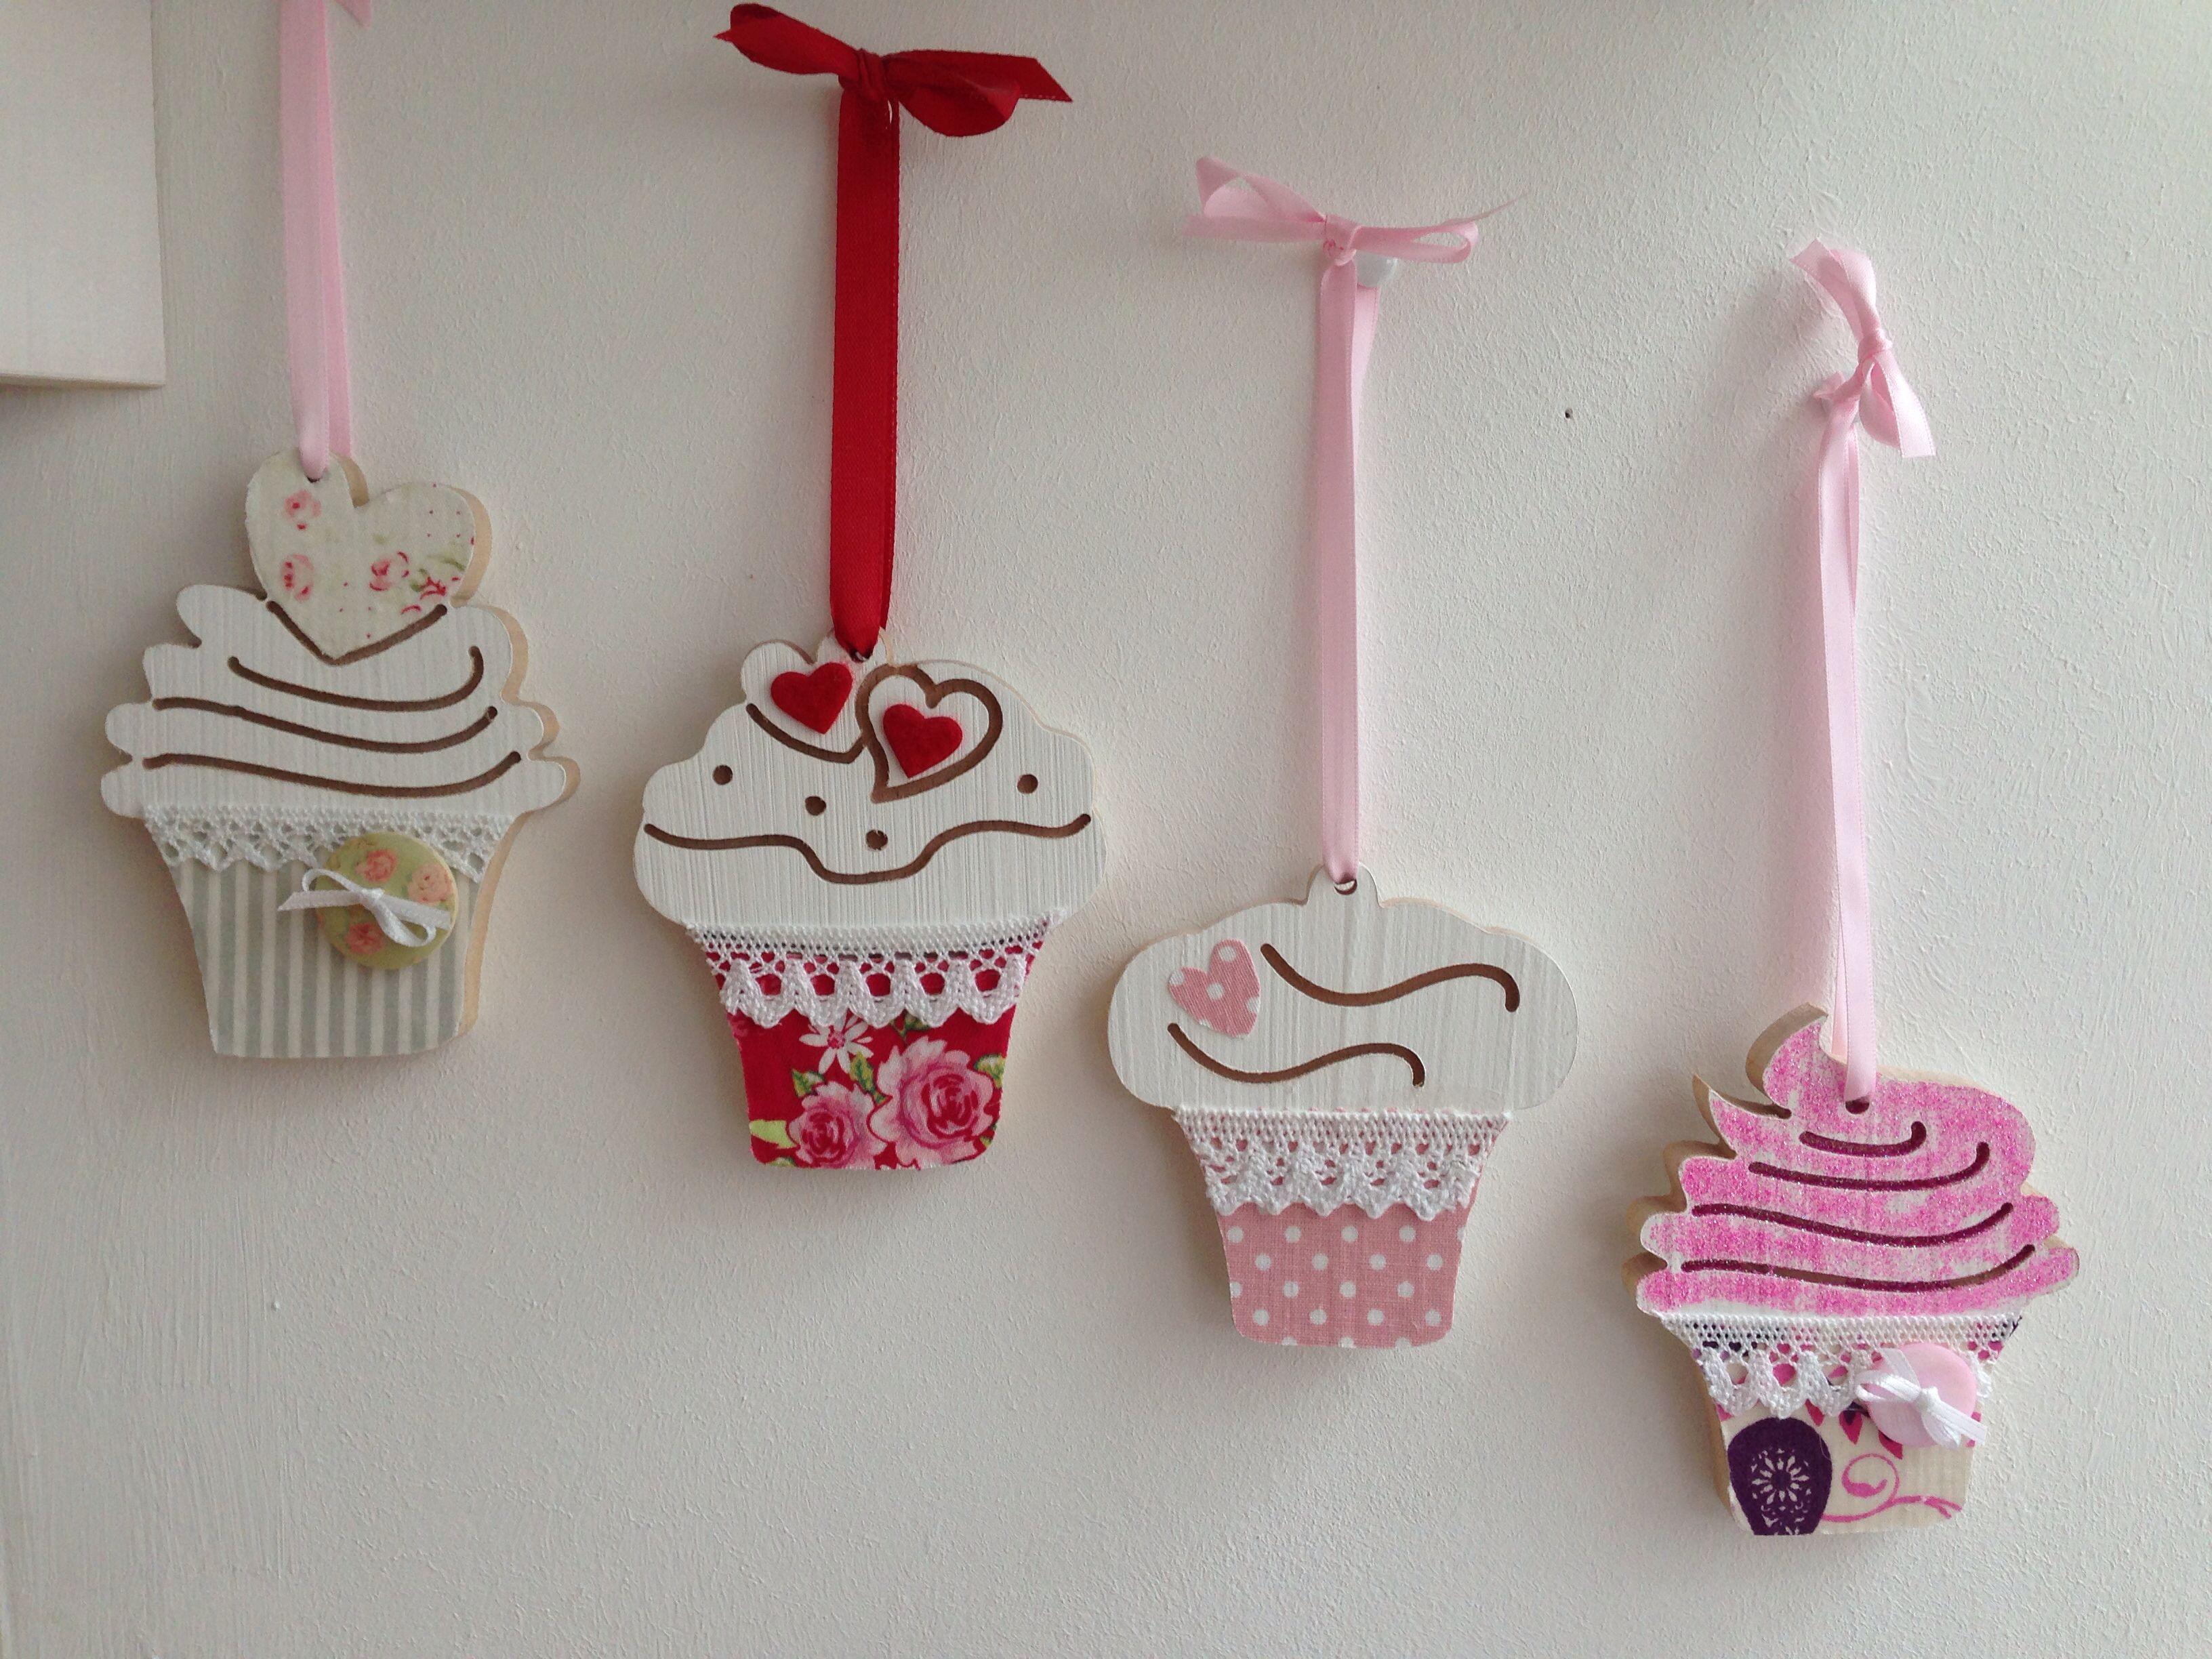 Cupcakes Home Decor Oo Cu Cupcak Pinterest Home Decorators Catalog Best Ideas of Home Decor and Design [homedecoratorscatalog.us]